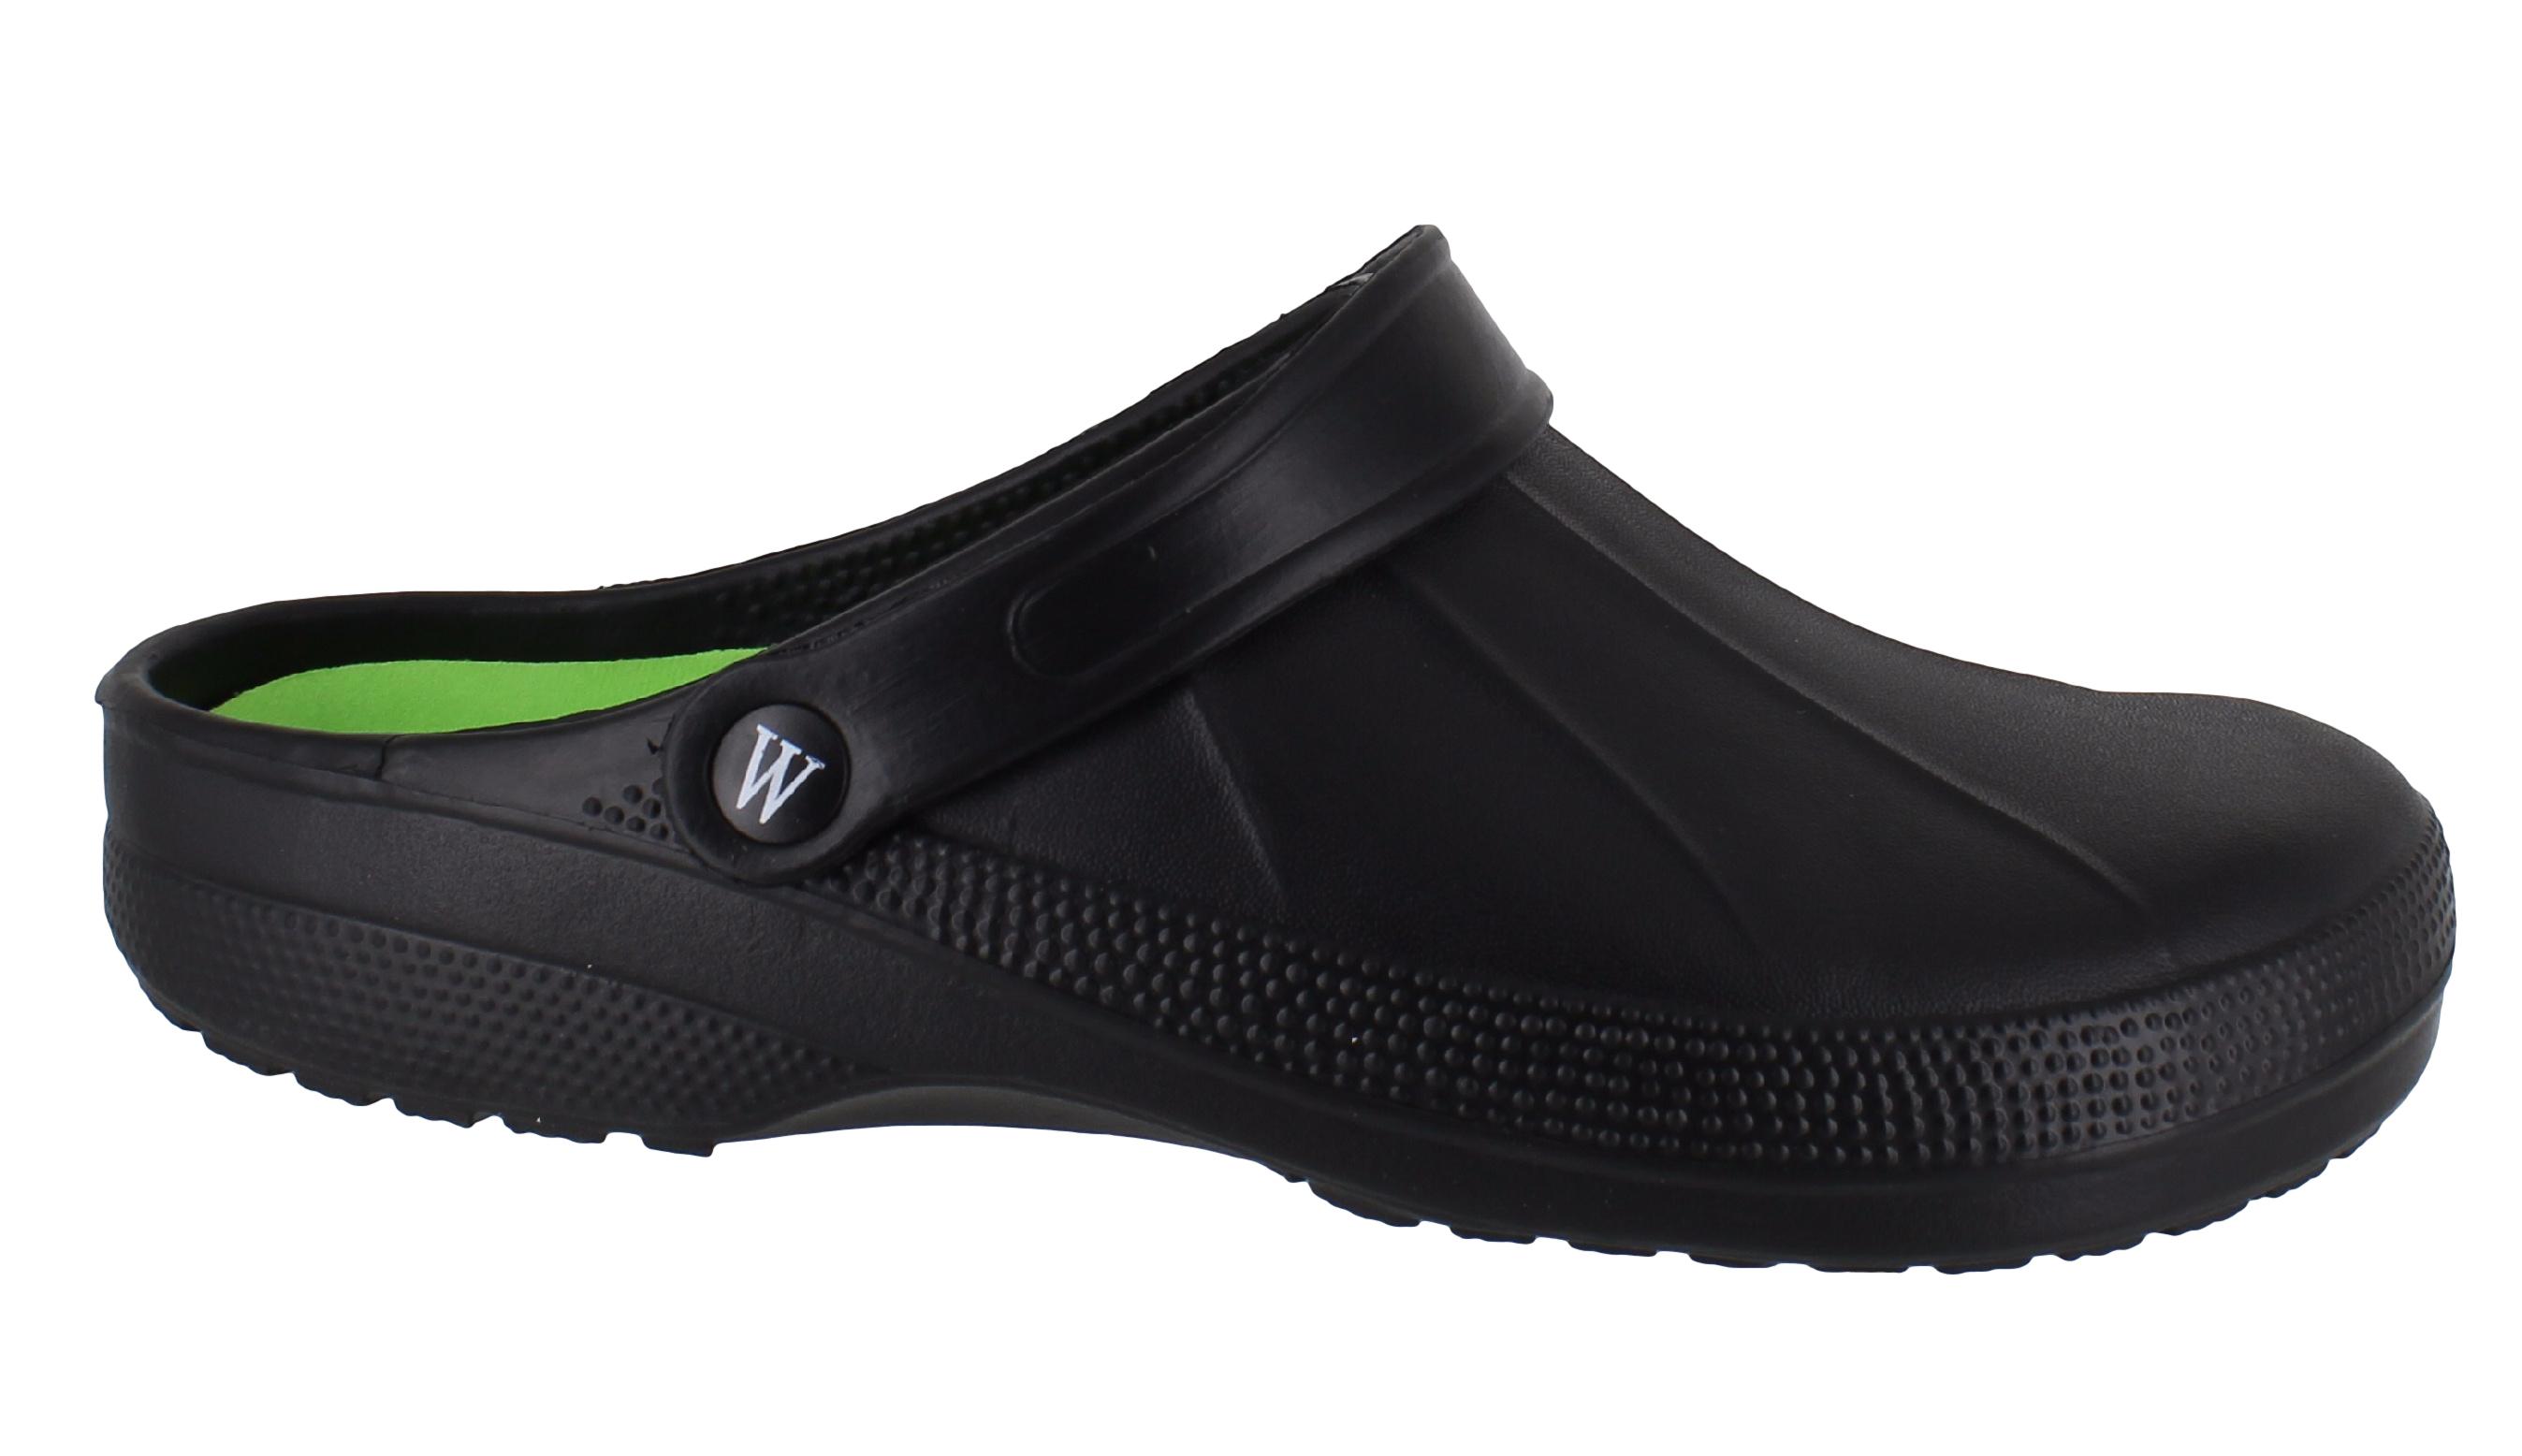 kitchen shoes for men how to build cabinet doors mens wetlands lightweight slip on garden hospital